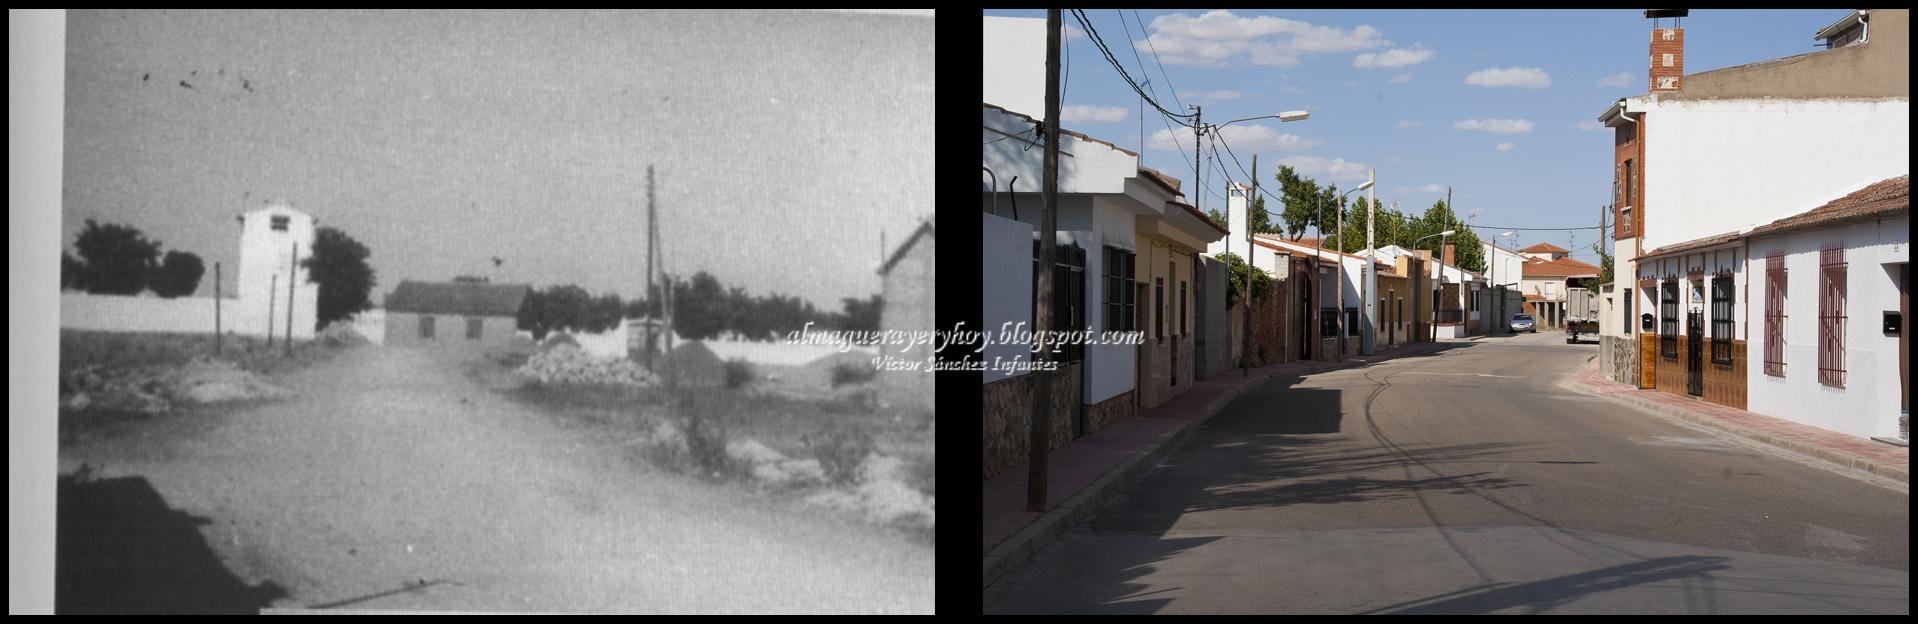 Calle Miguel de Cervantes